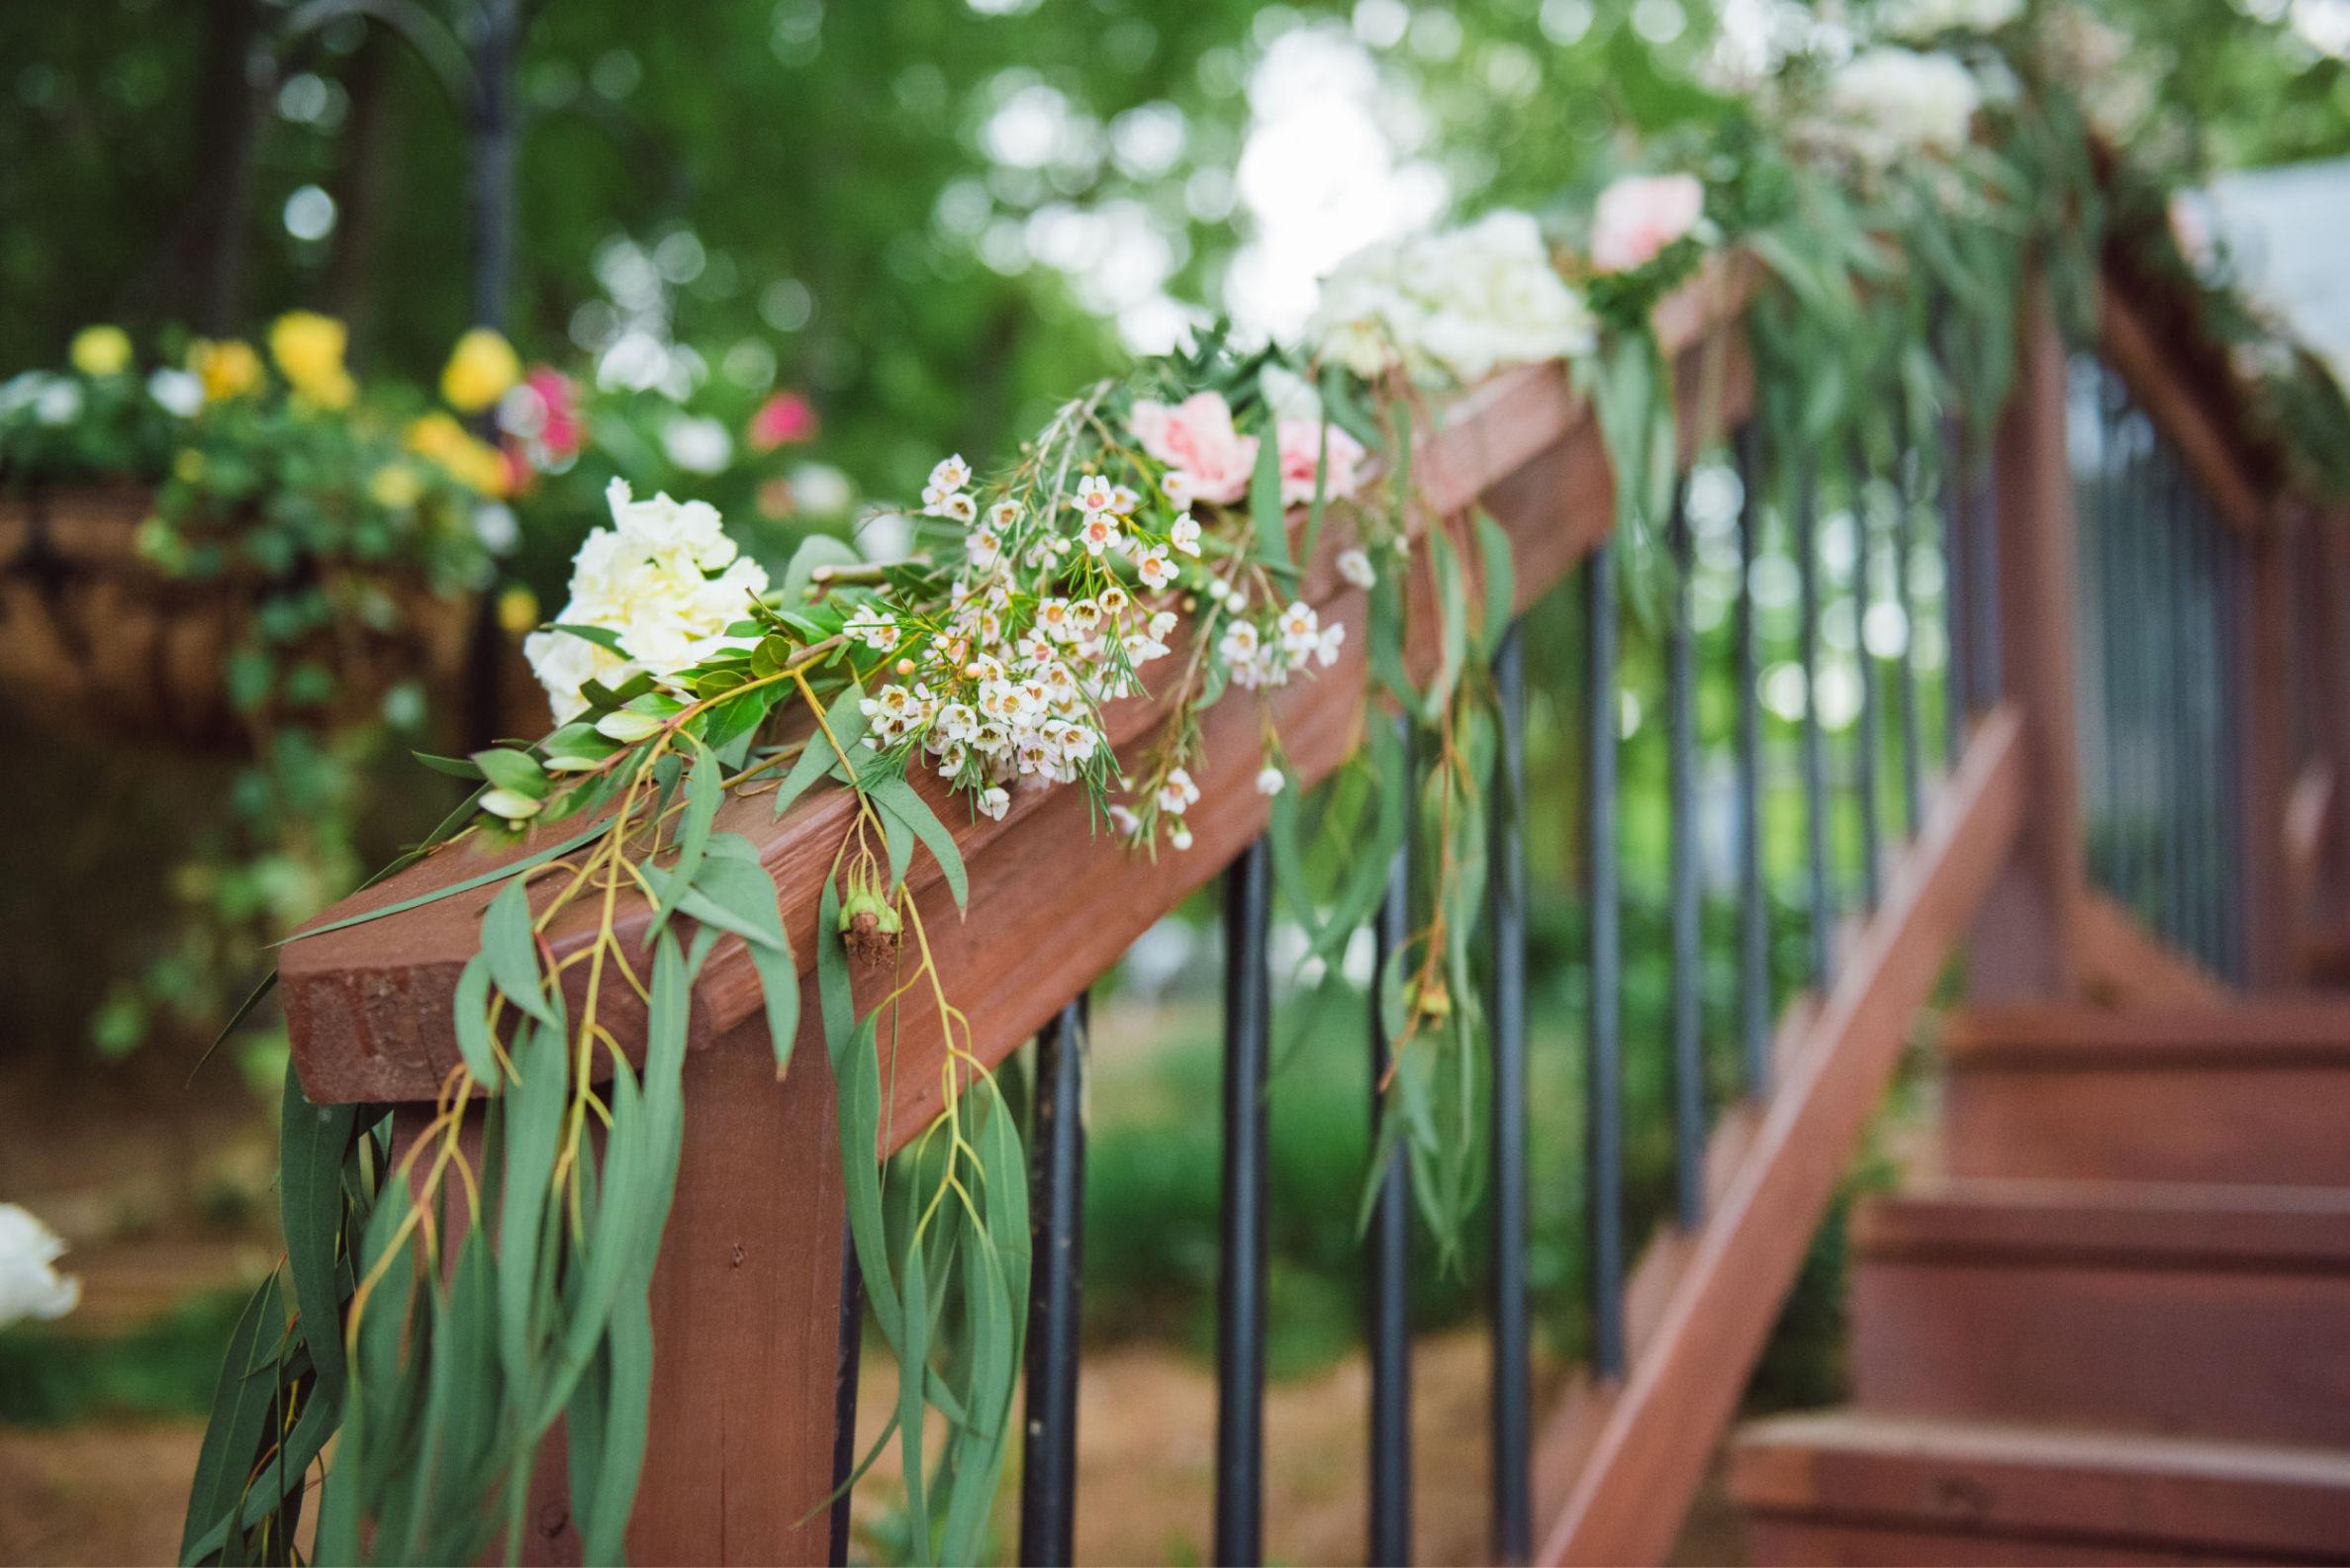 River_Rest_Weddings_Website_Blog-4.jpg